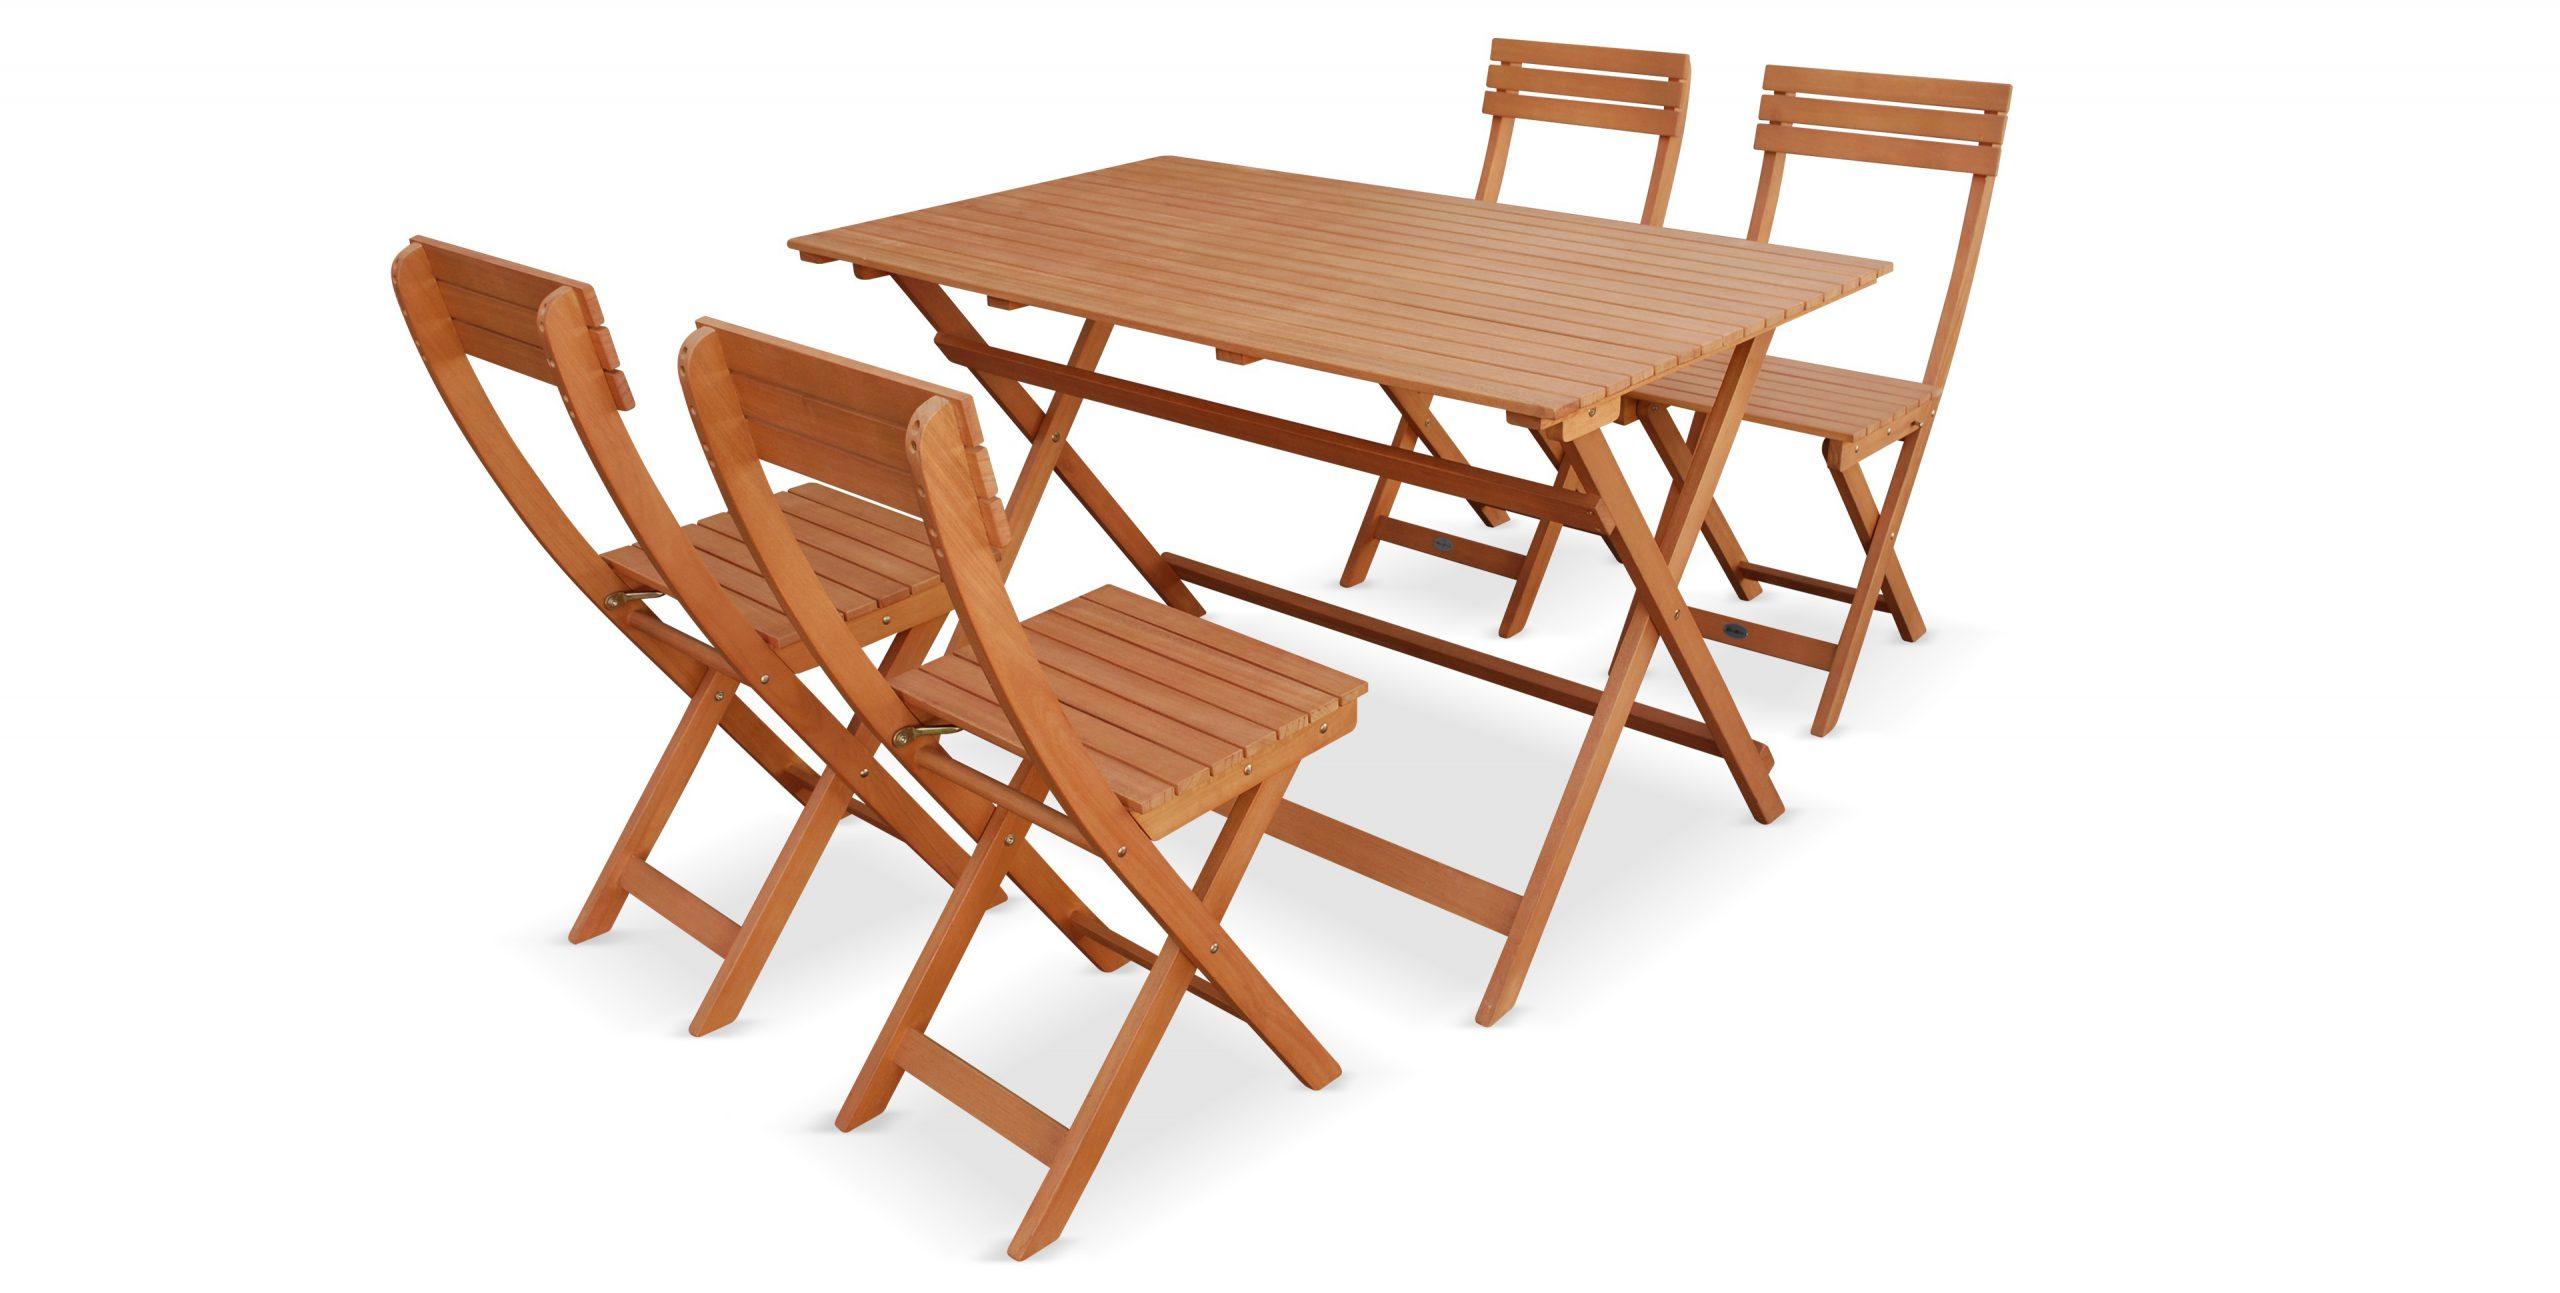 De Pliante Table Bois Pliante De Jardin Jardin Bois Table ... tout Table De Jardin En Bois Pliante